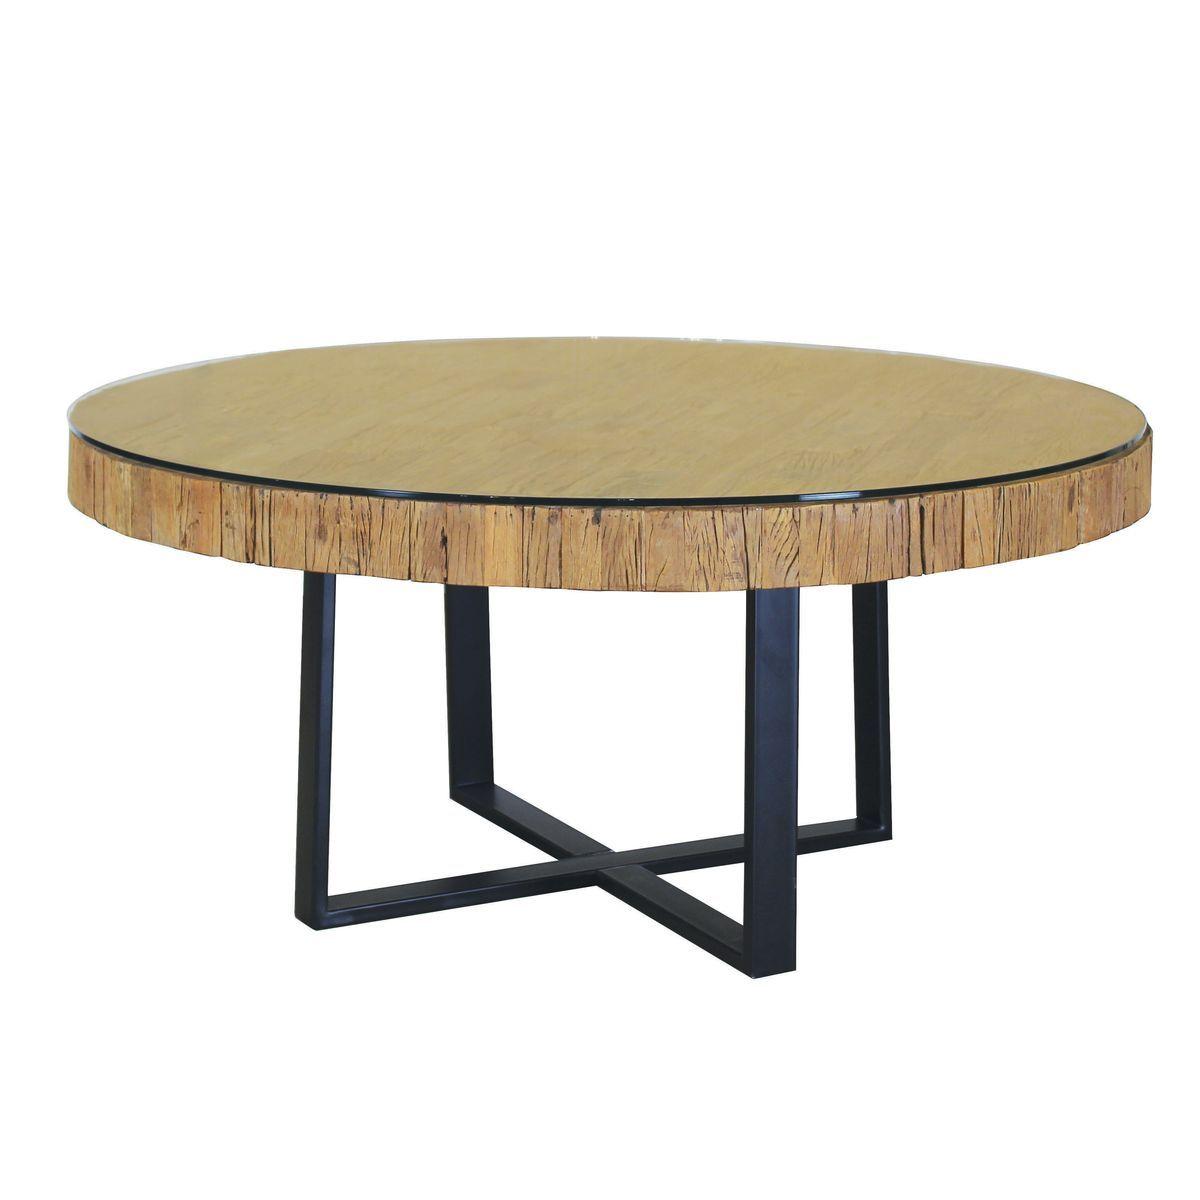 Table ronde en teck et verre 160cm